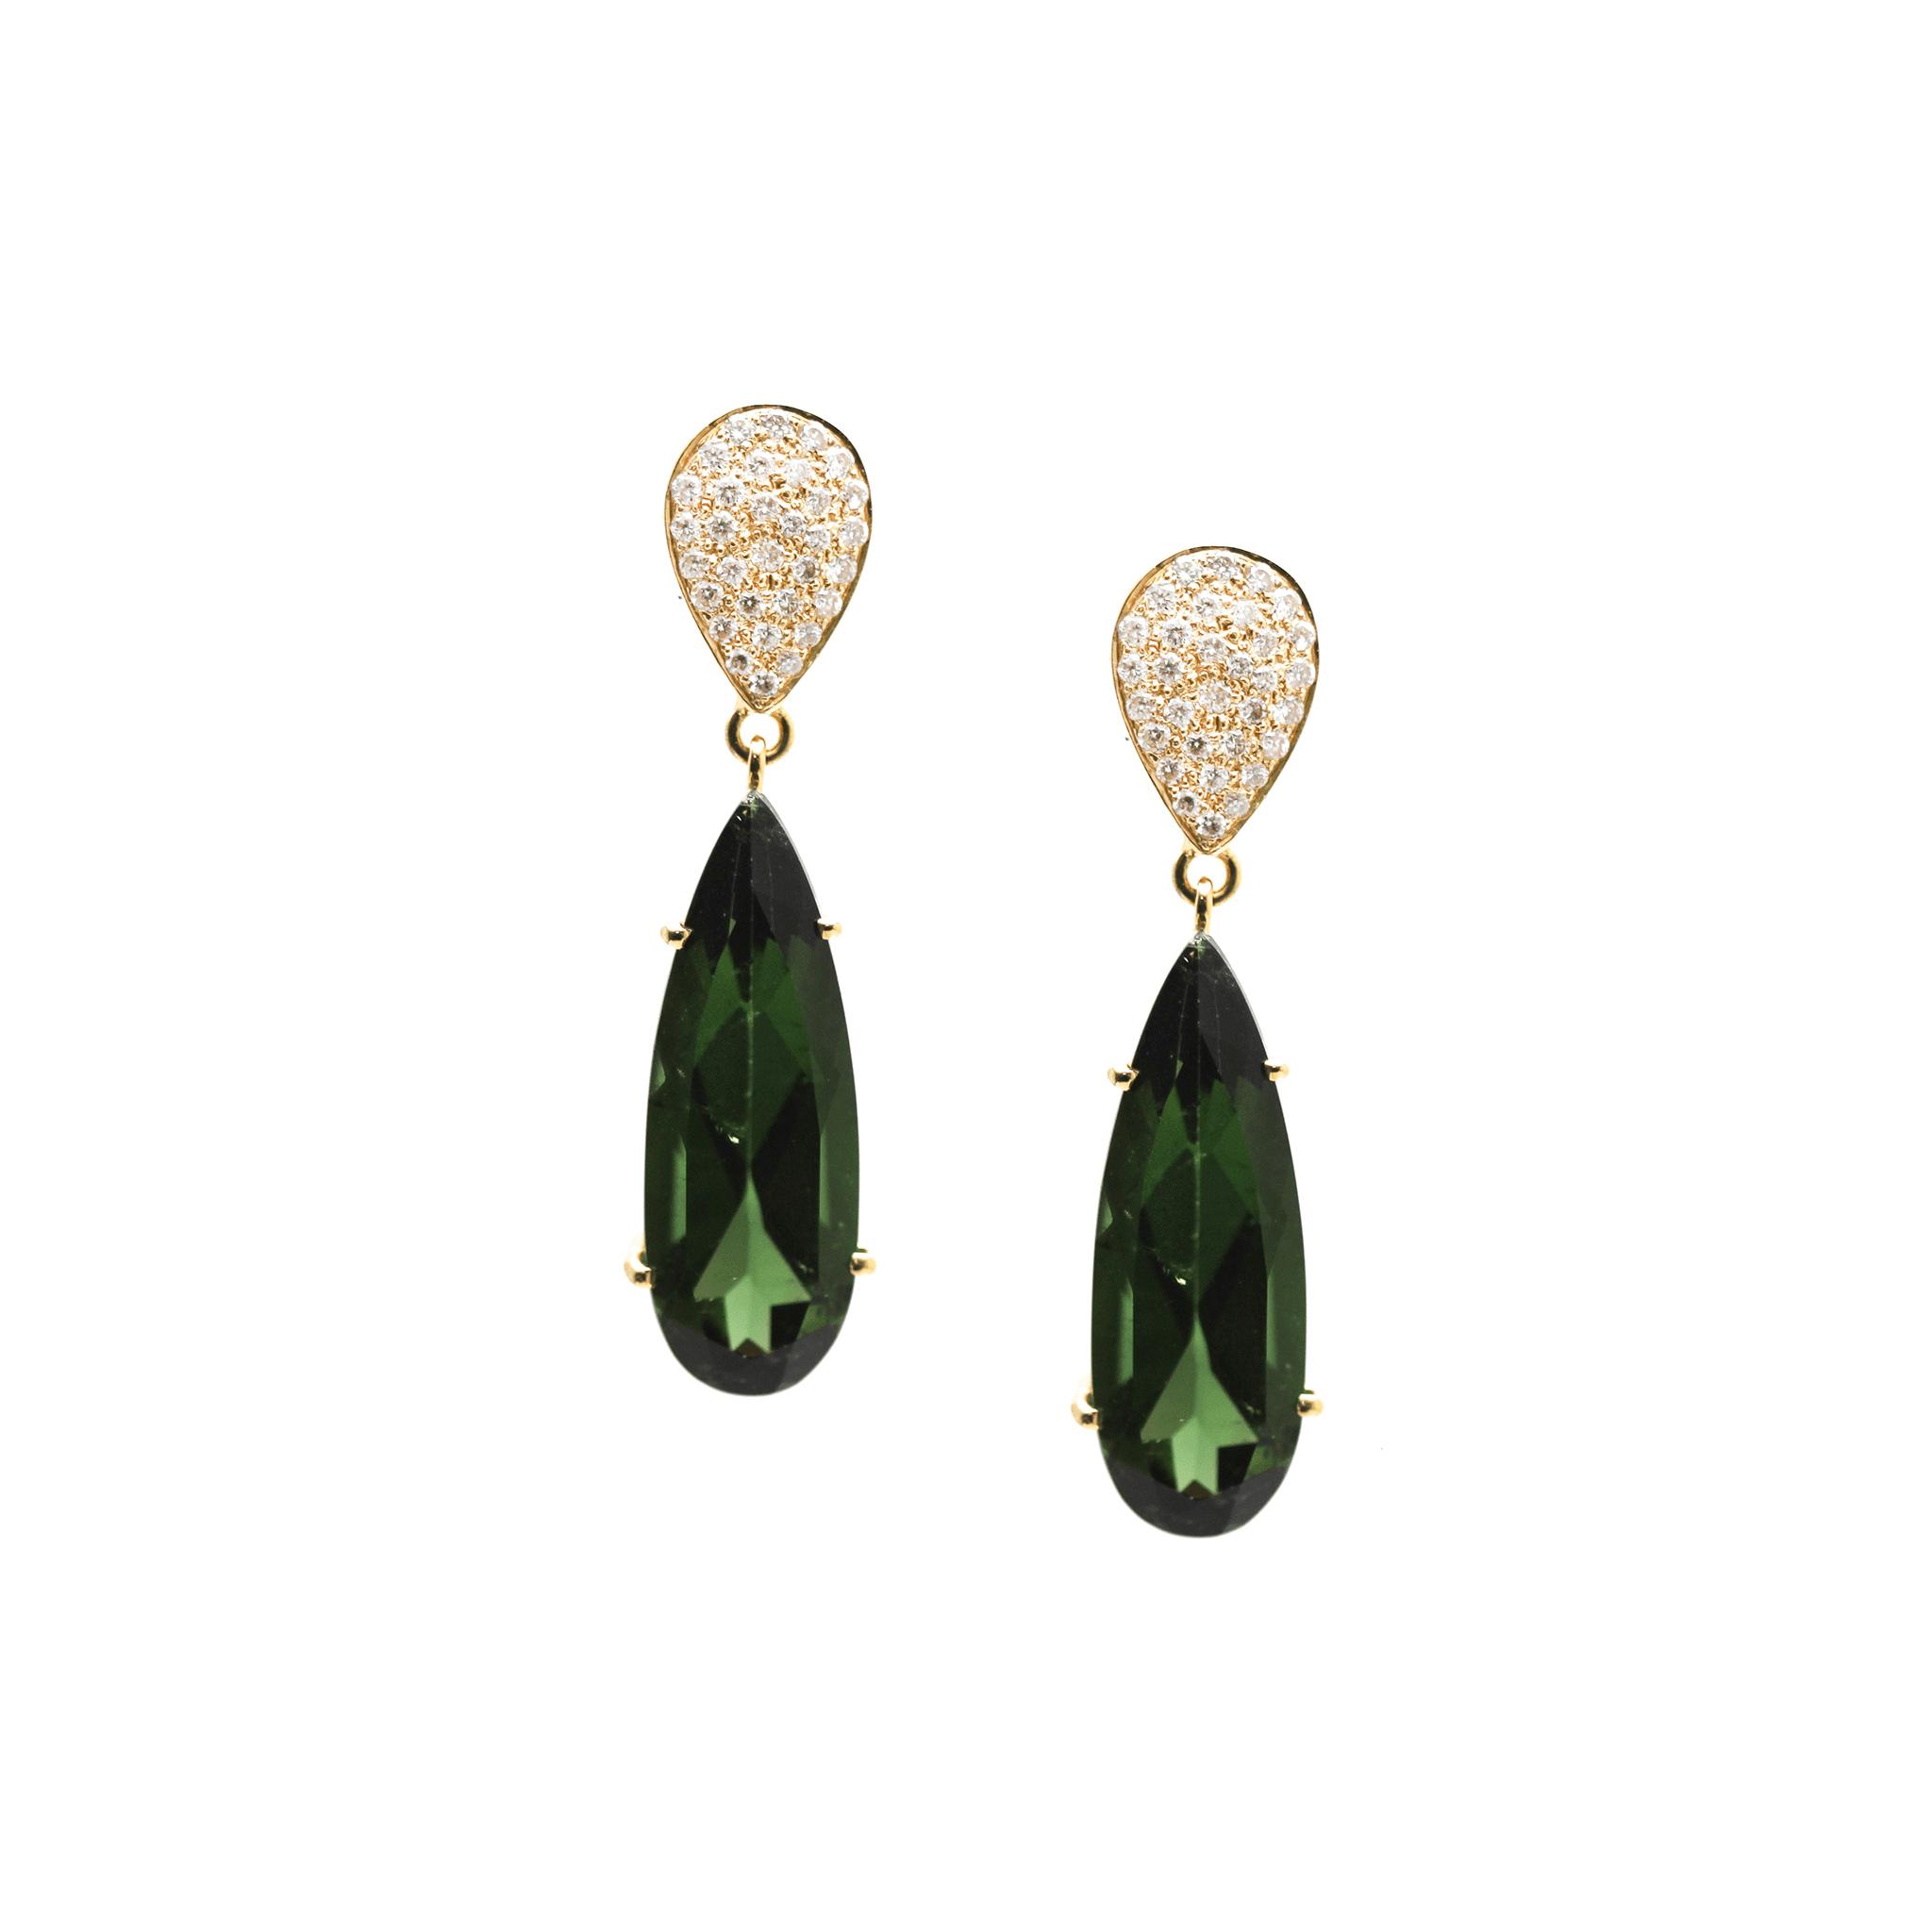 Tresor Collection - Green Tourmaline & Diamond Earrings In 18k Yellow Gold